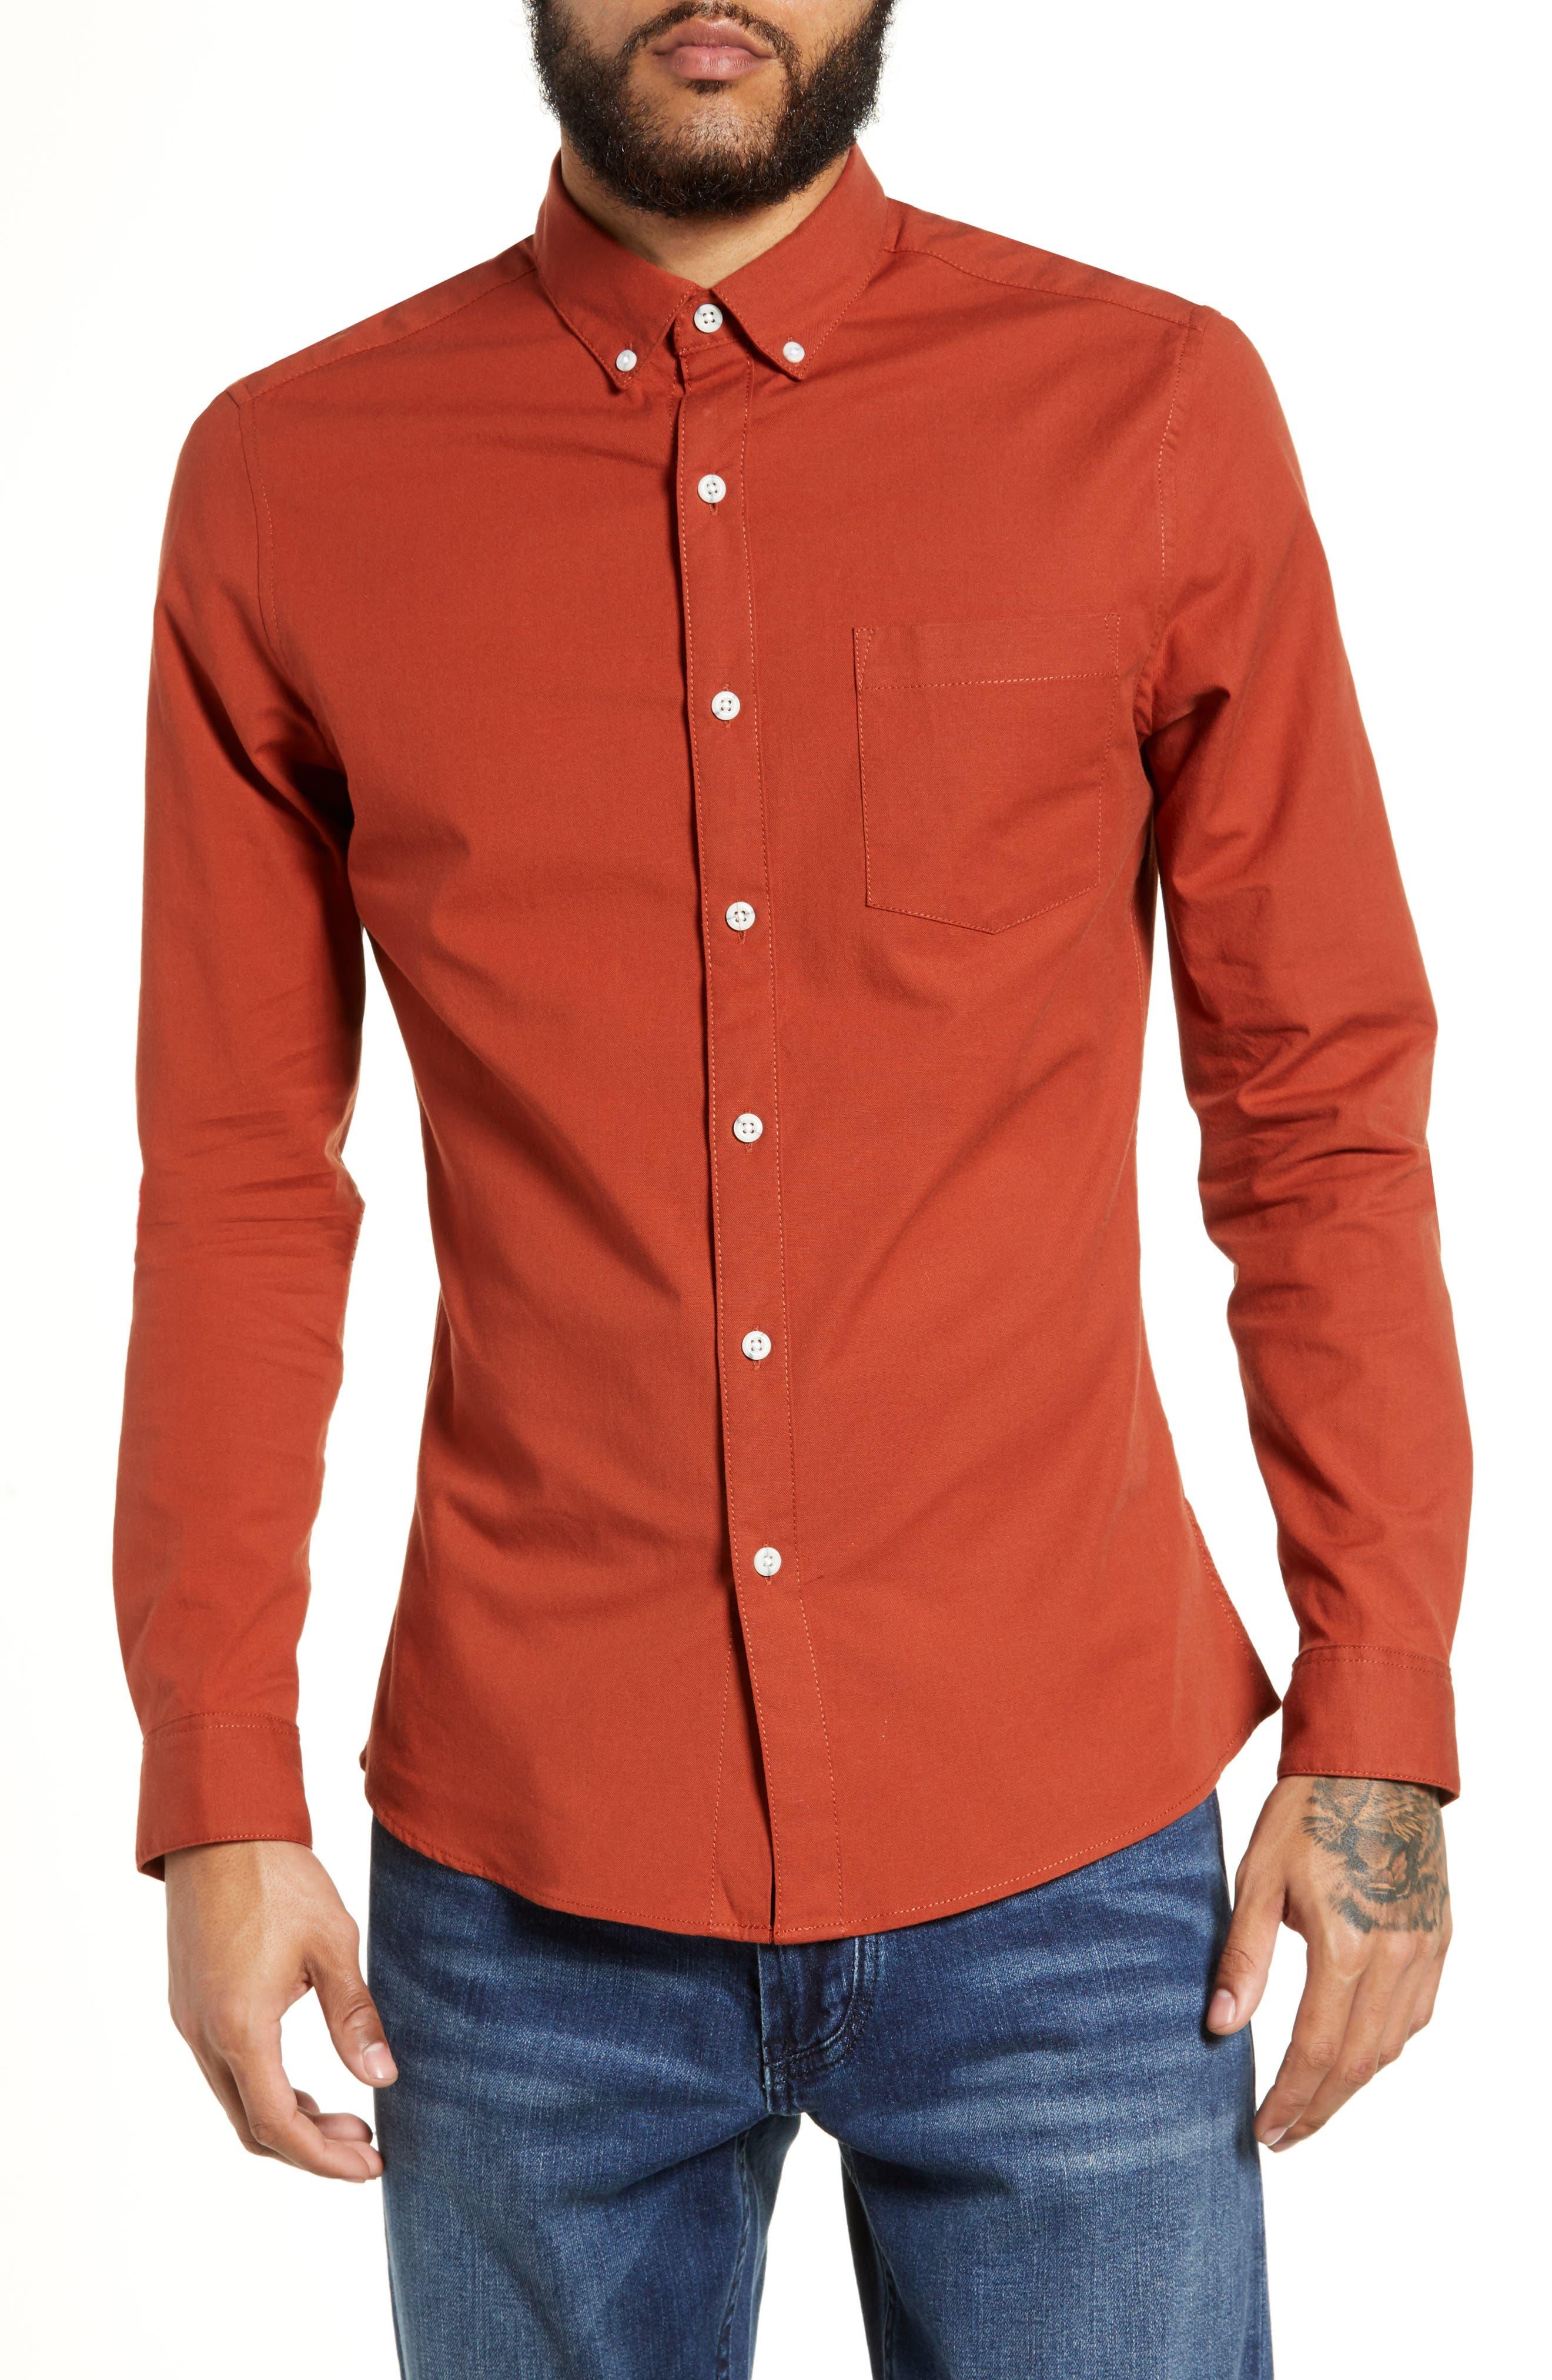 TOPMAN Classic Fit Oxford Shirt, Main, color, BROWN